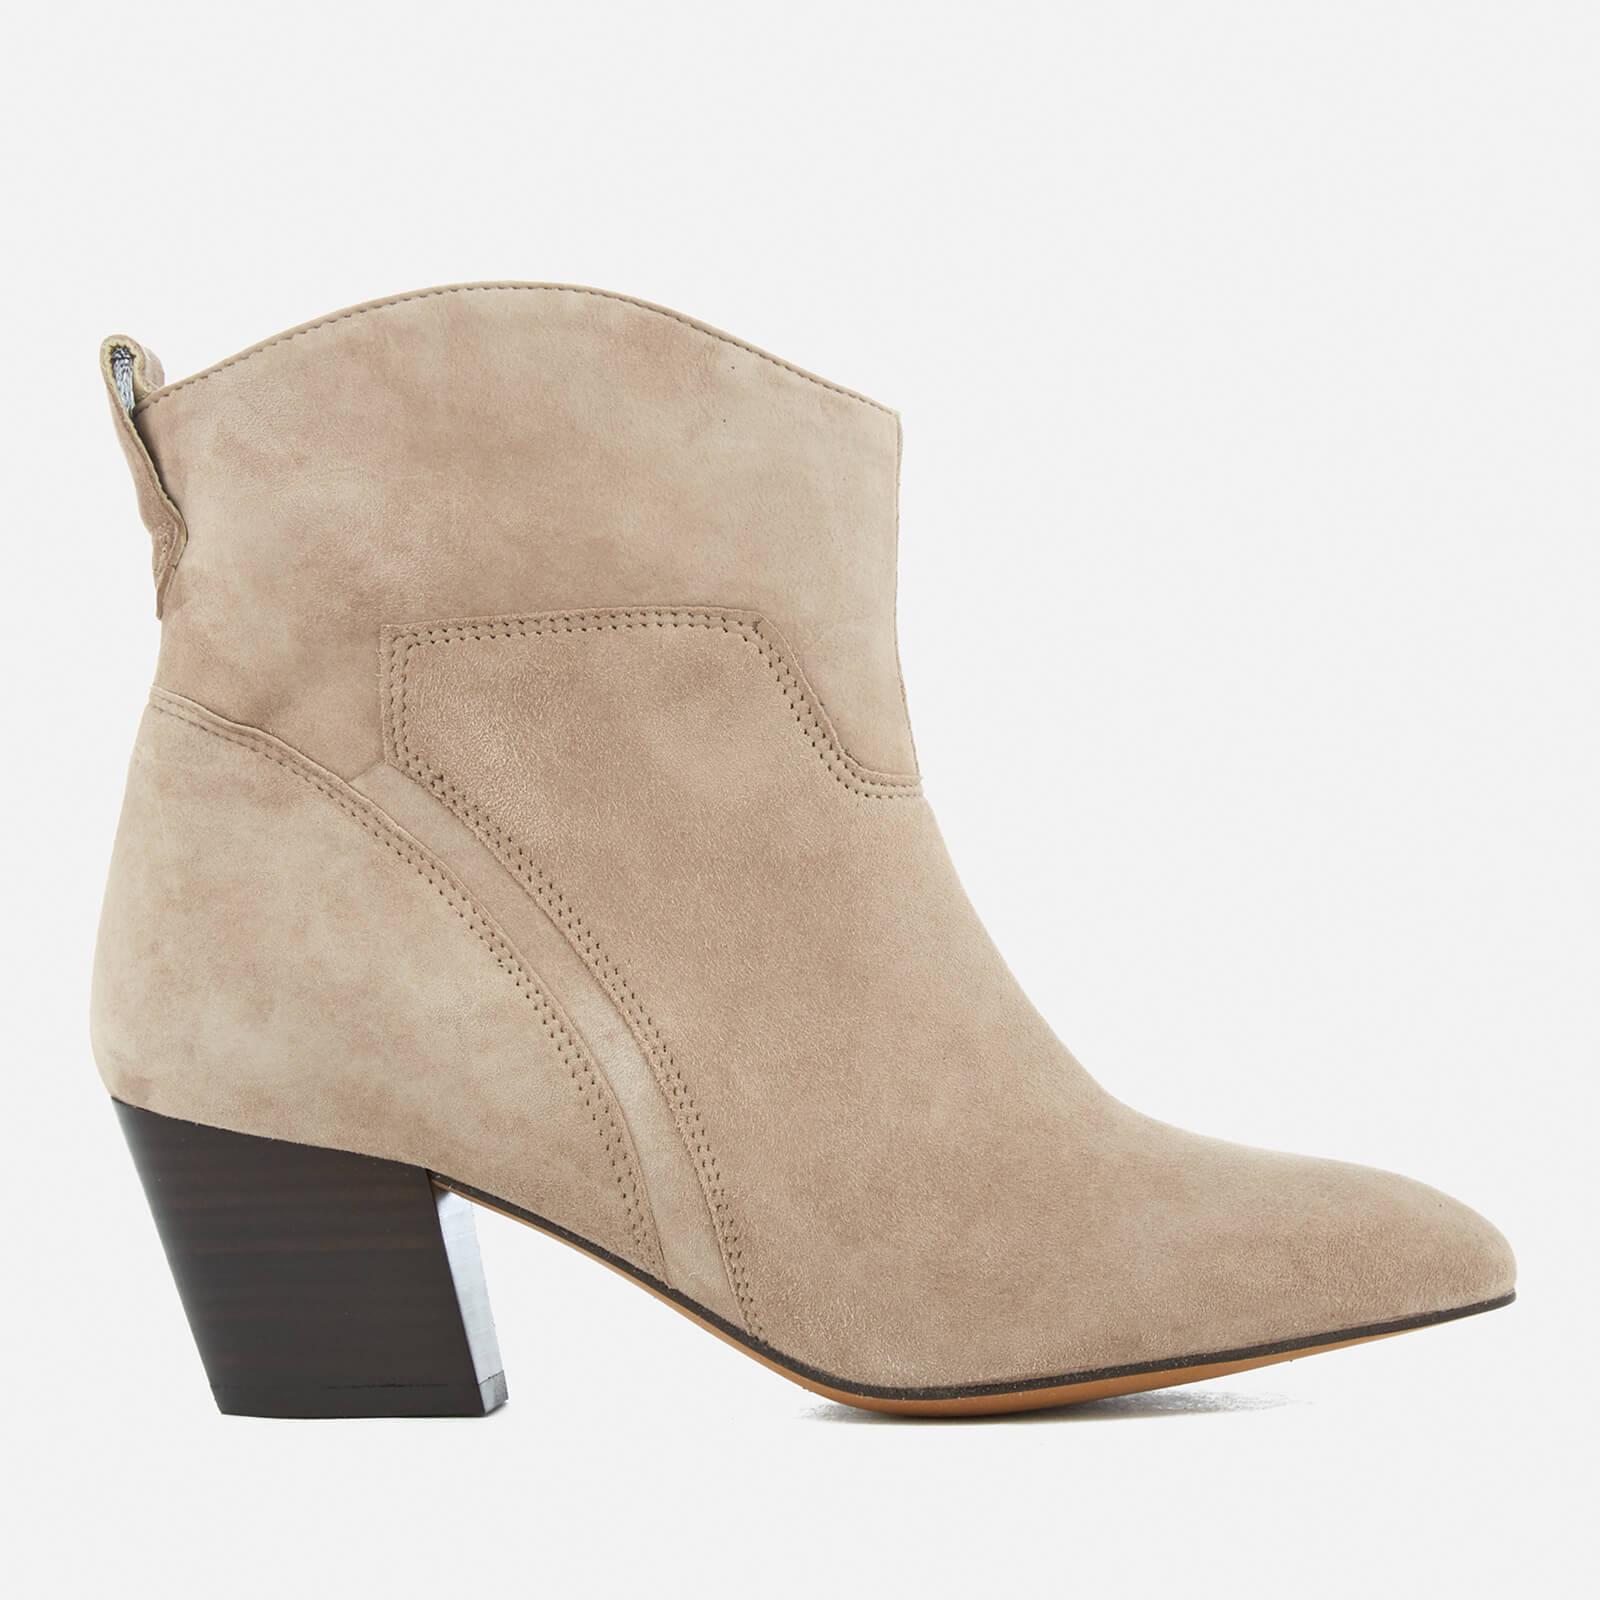 Hudson London Women's Karyn Suede Heeled Ankle Boots - Taupe - UK 3 - Beige